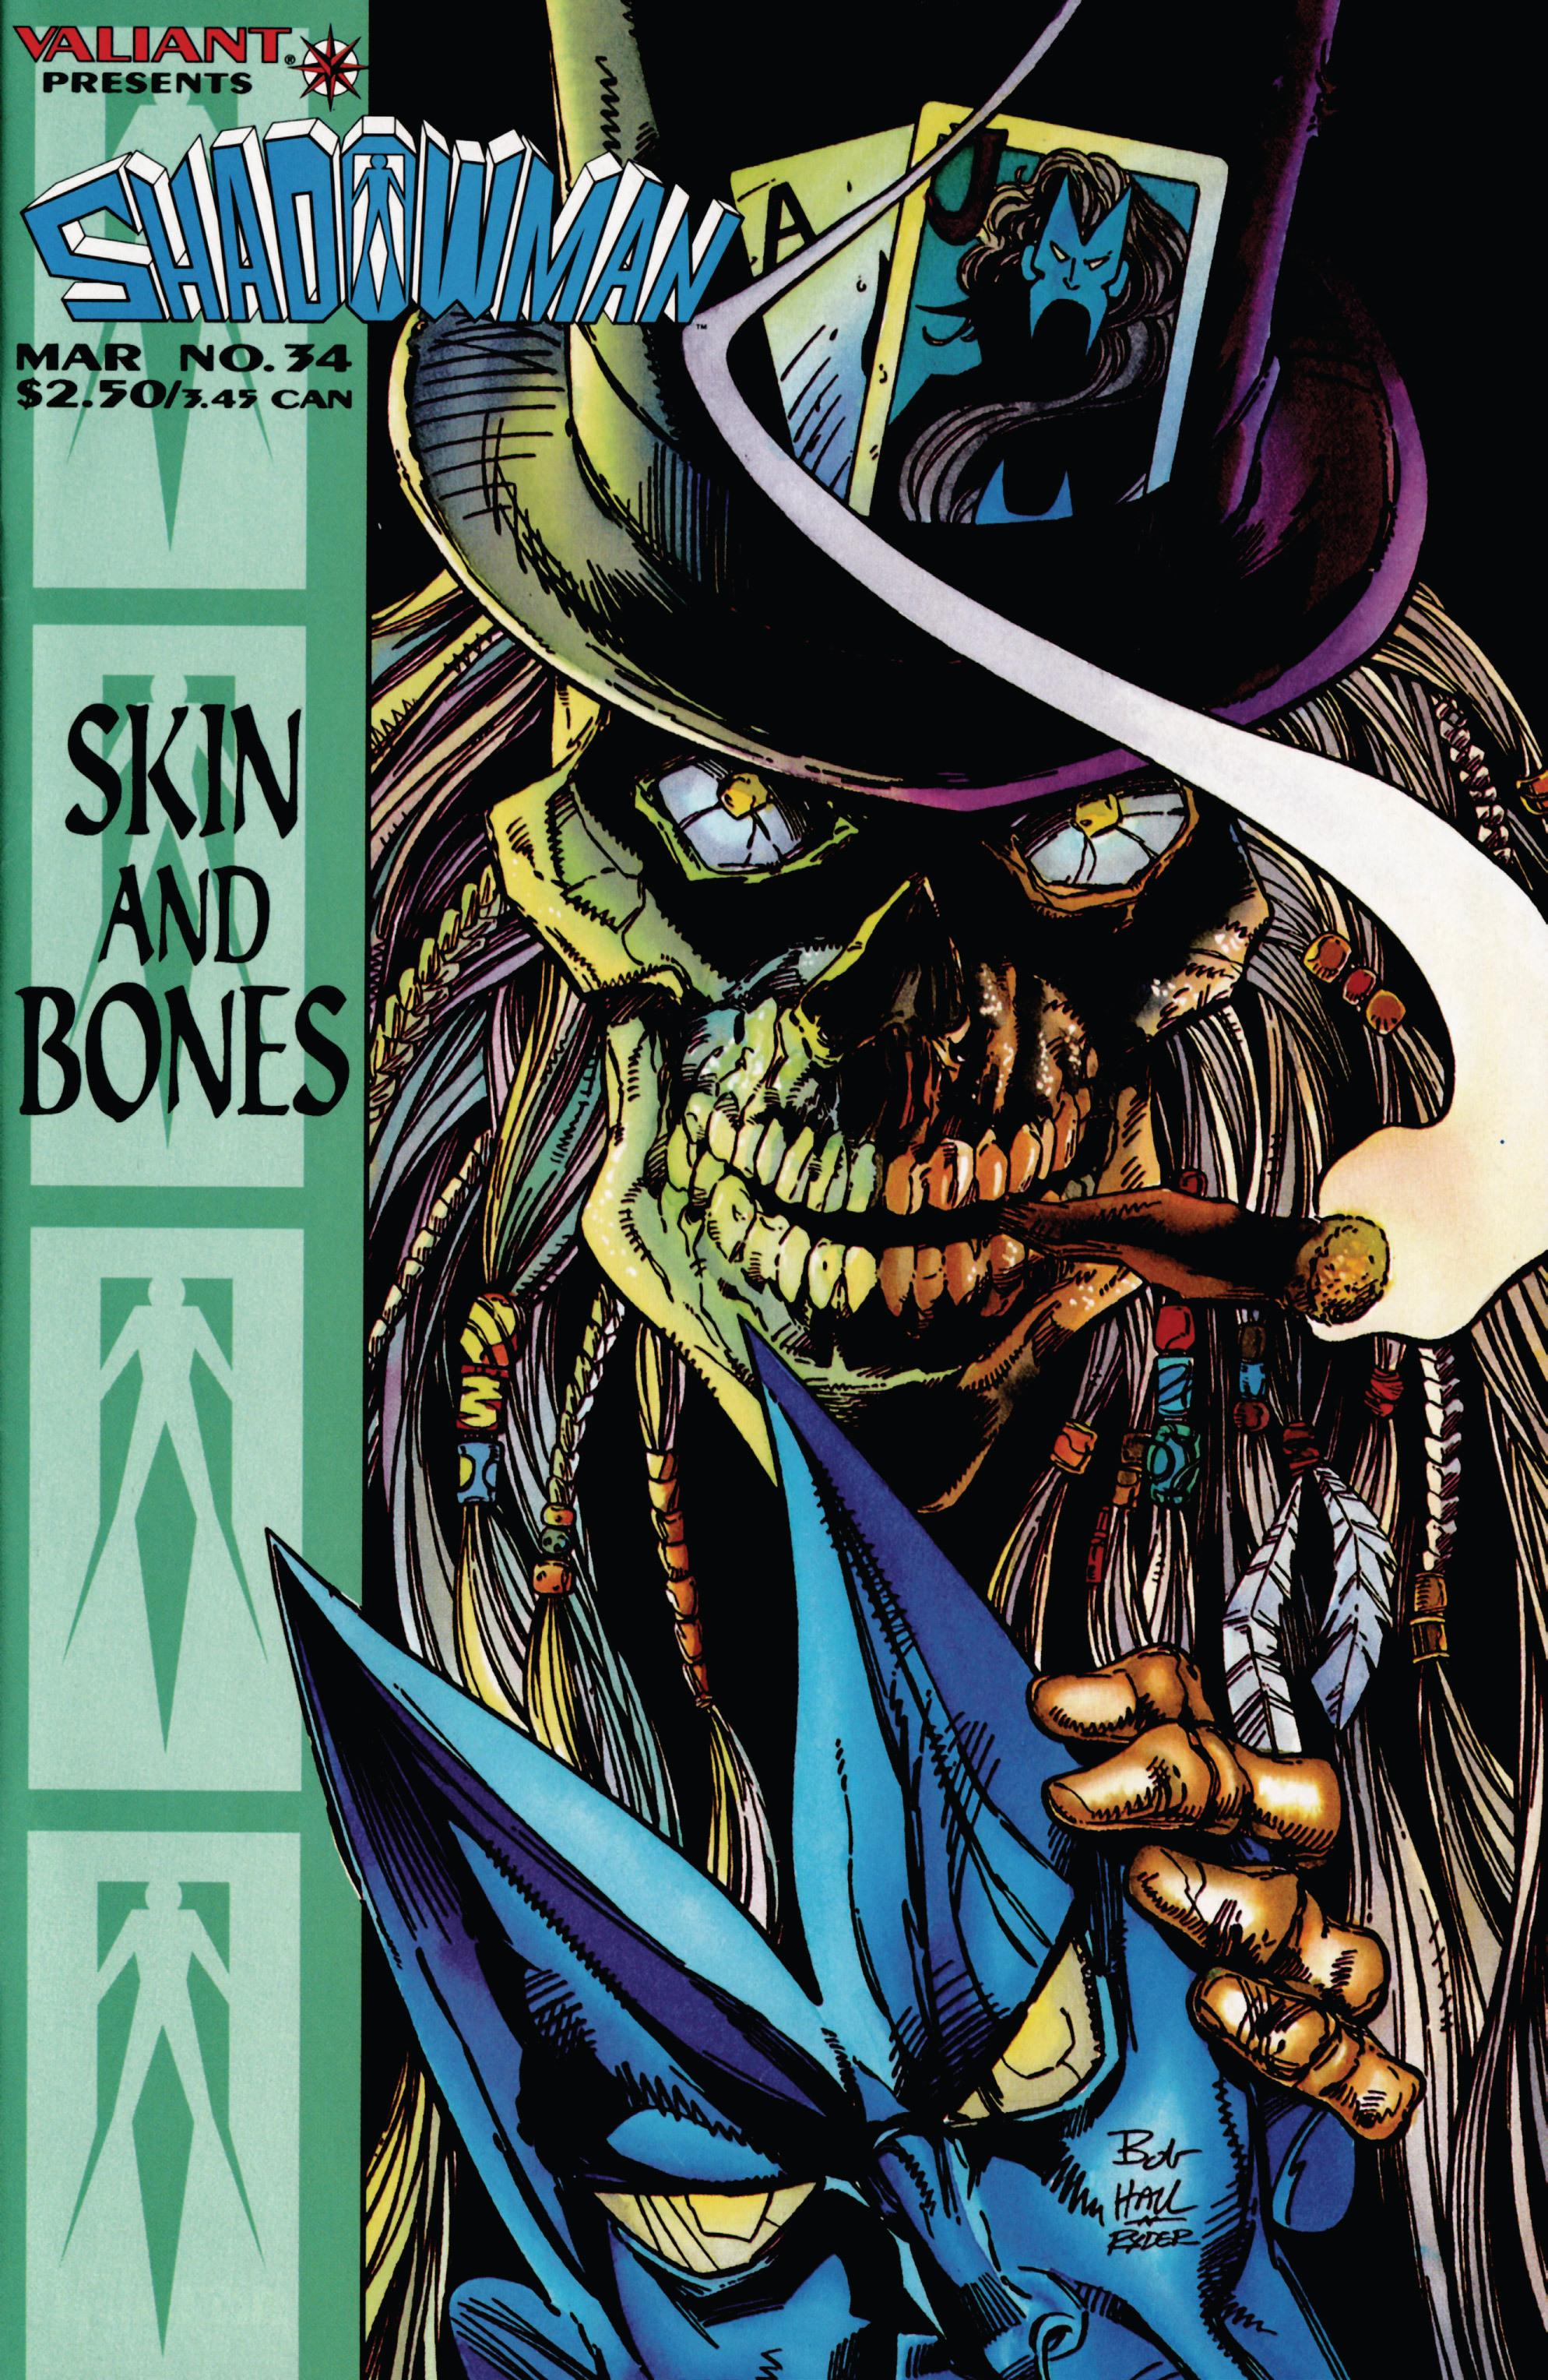 Read online Shadowman (1992) comic -  Issue #34 - 1